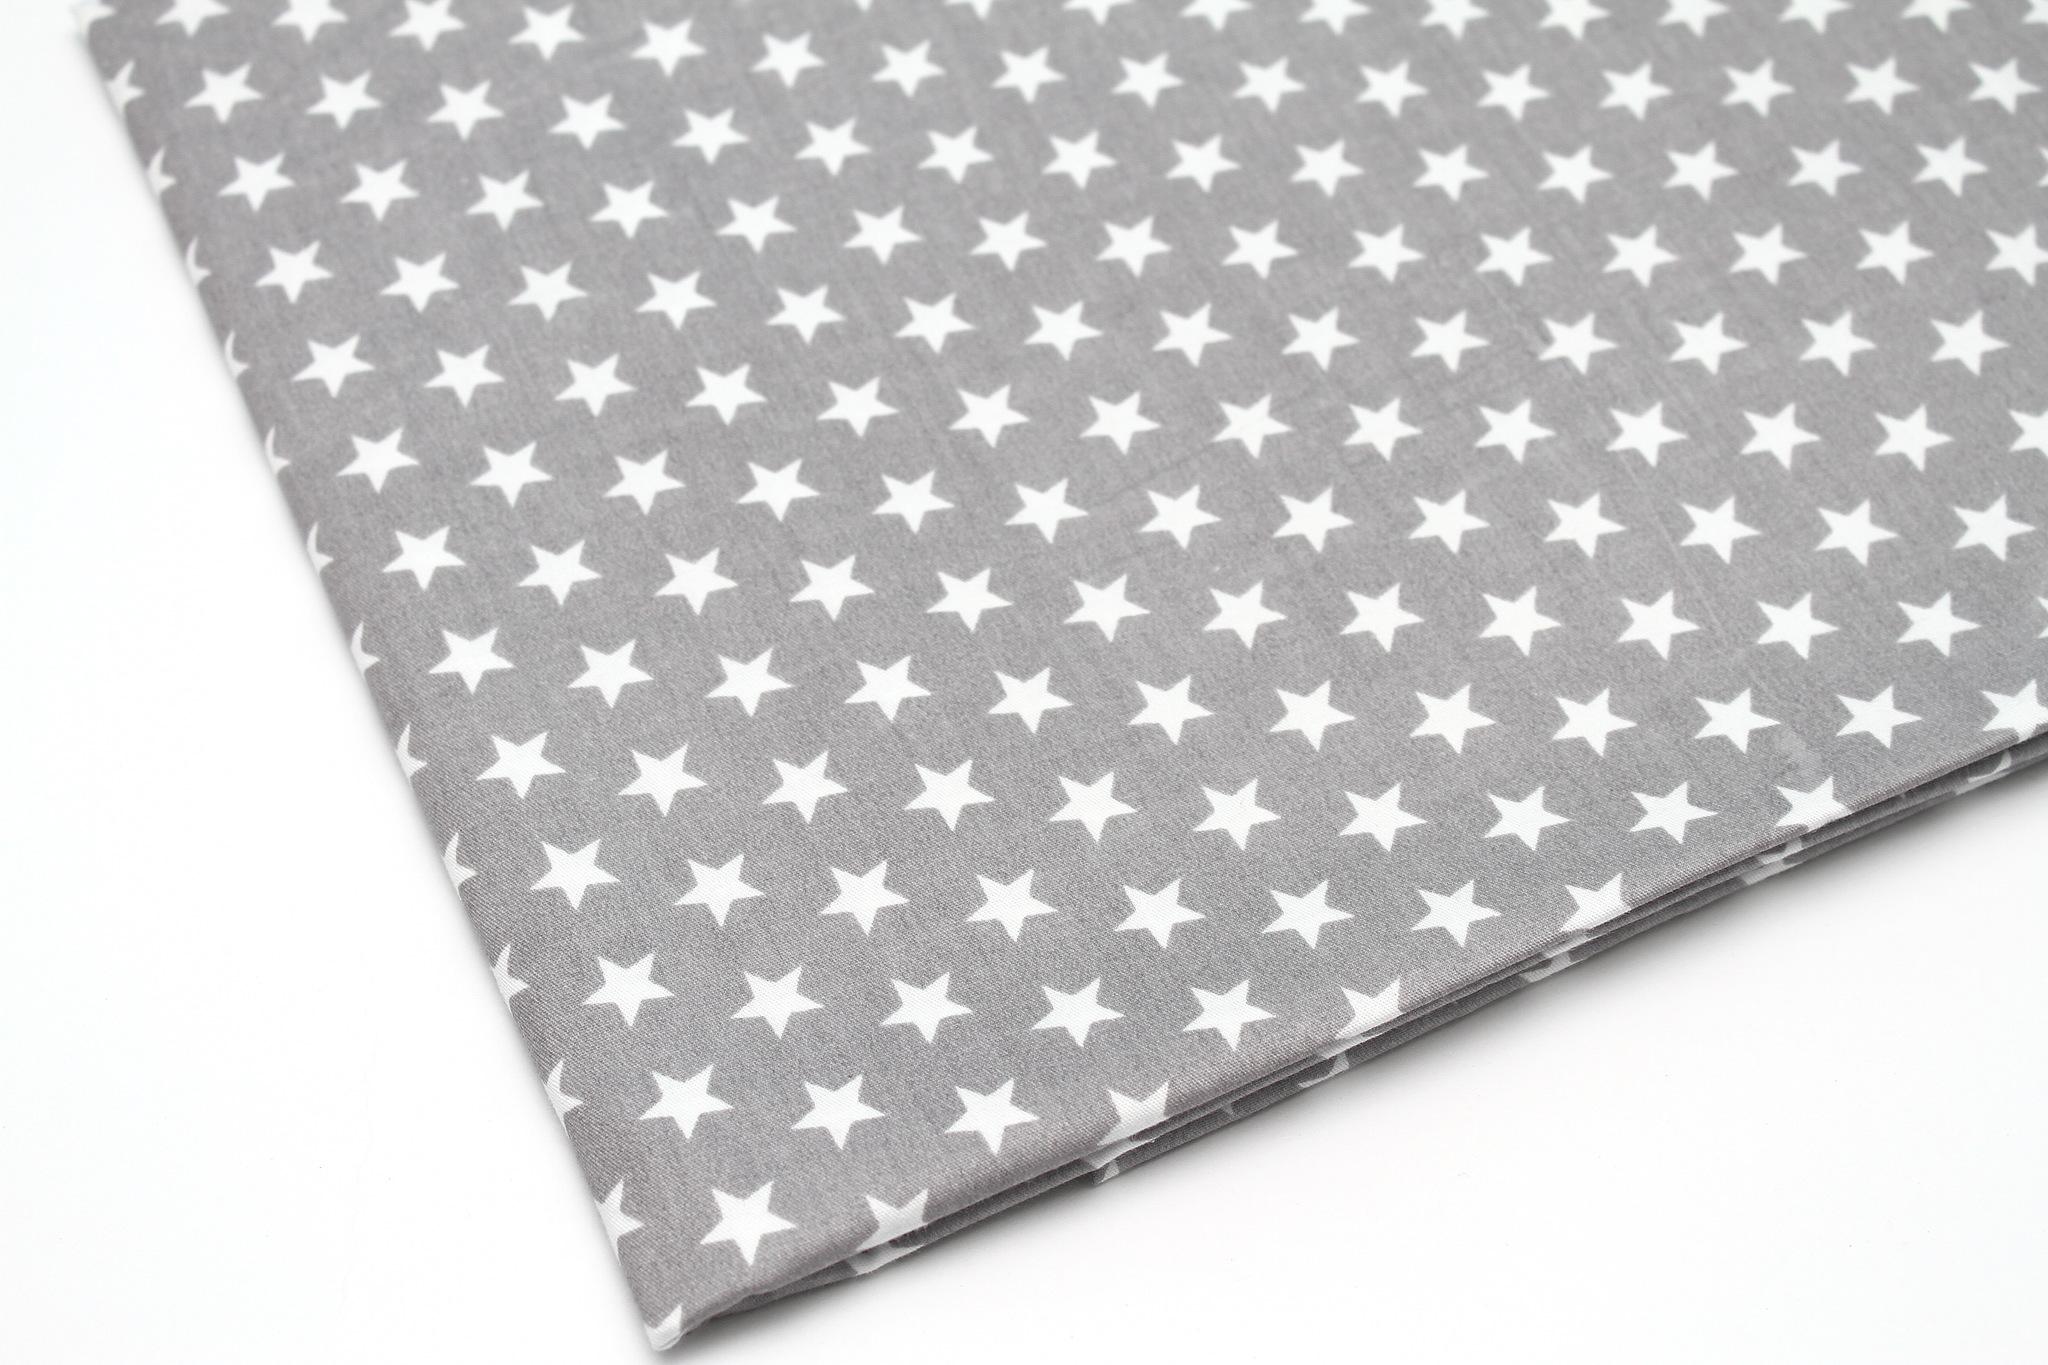 Звезды белые на сером,12 мм